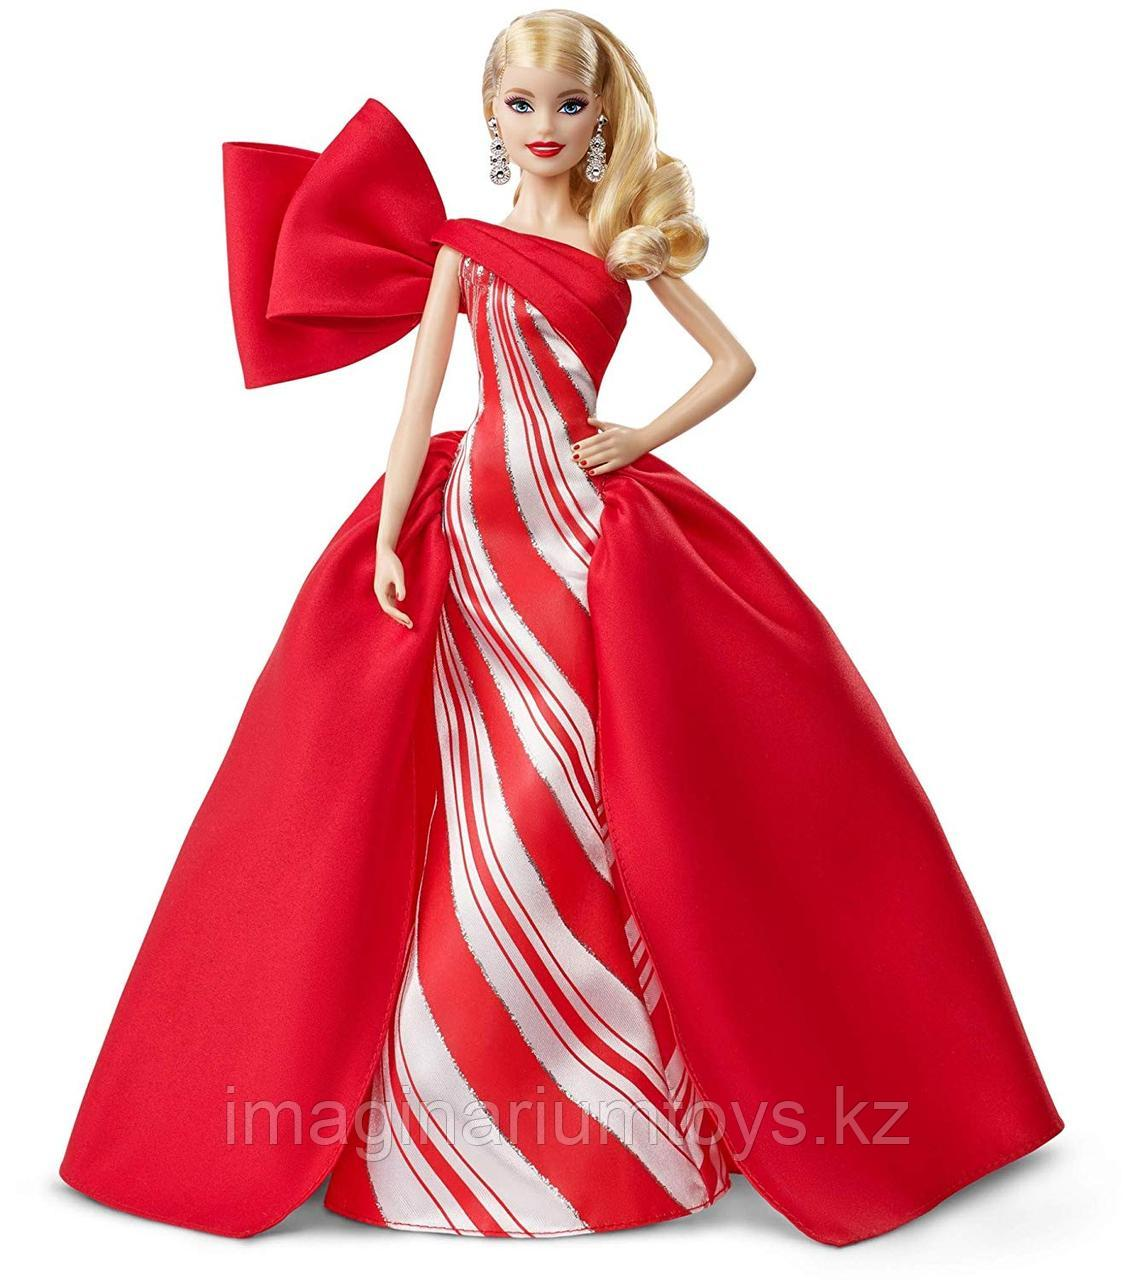 Barbie Коллекционная кукла Барби 2019